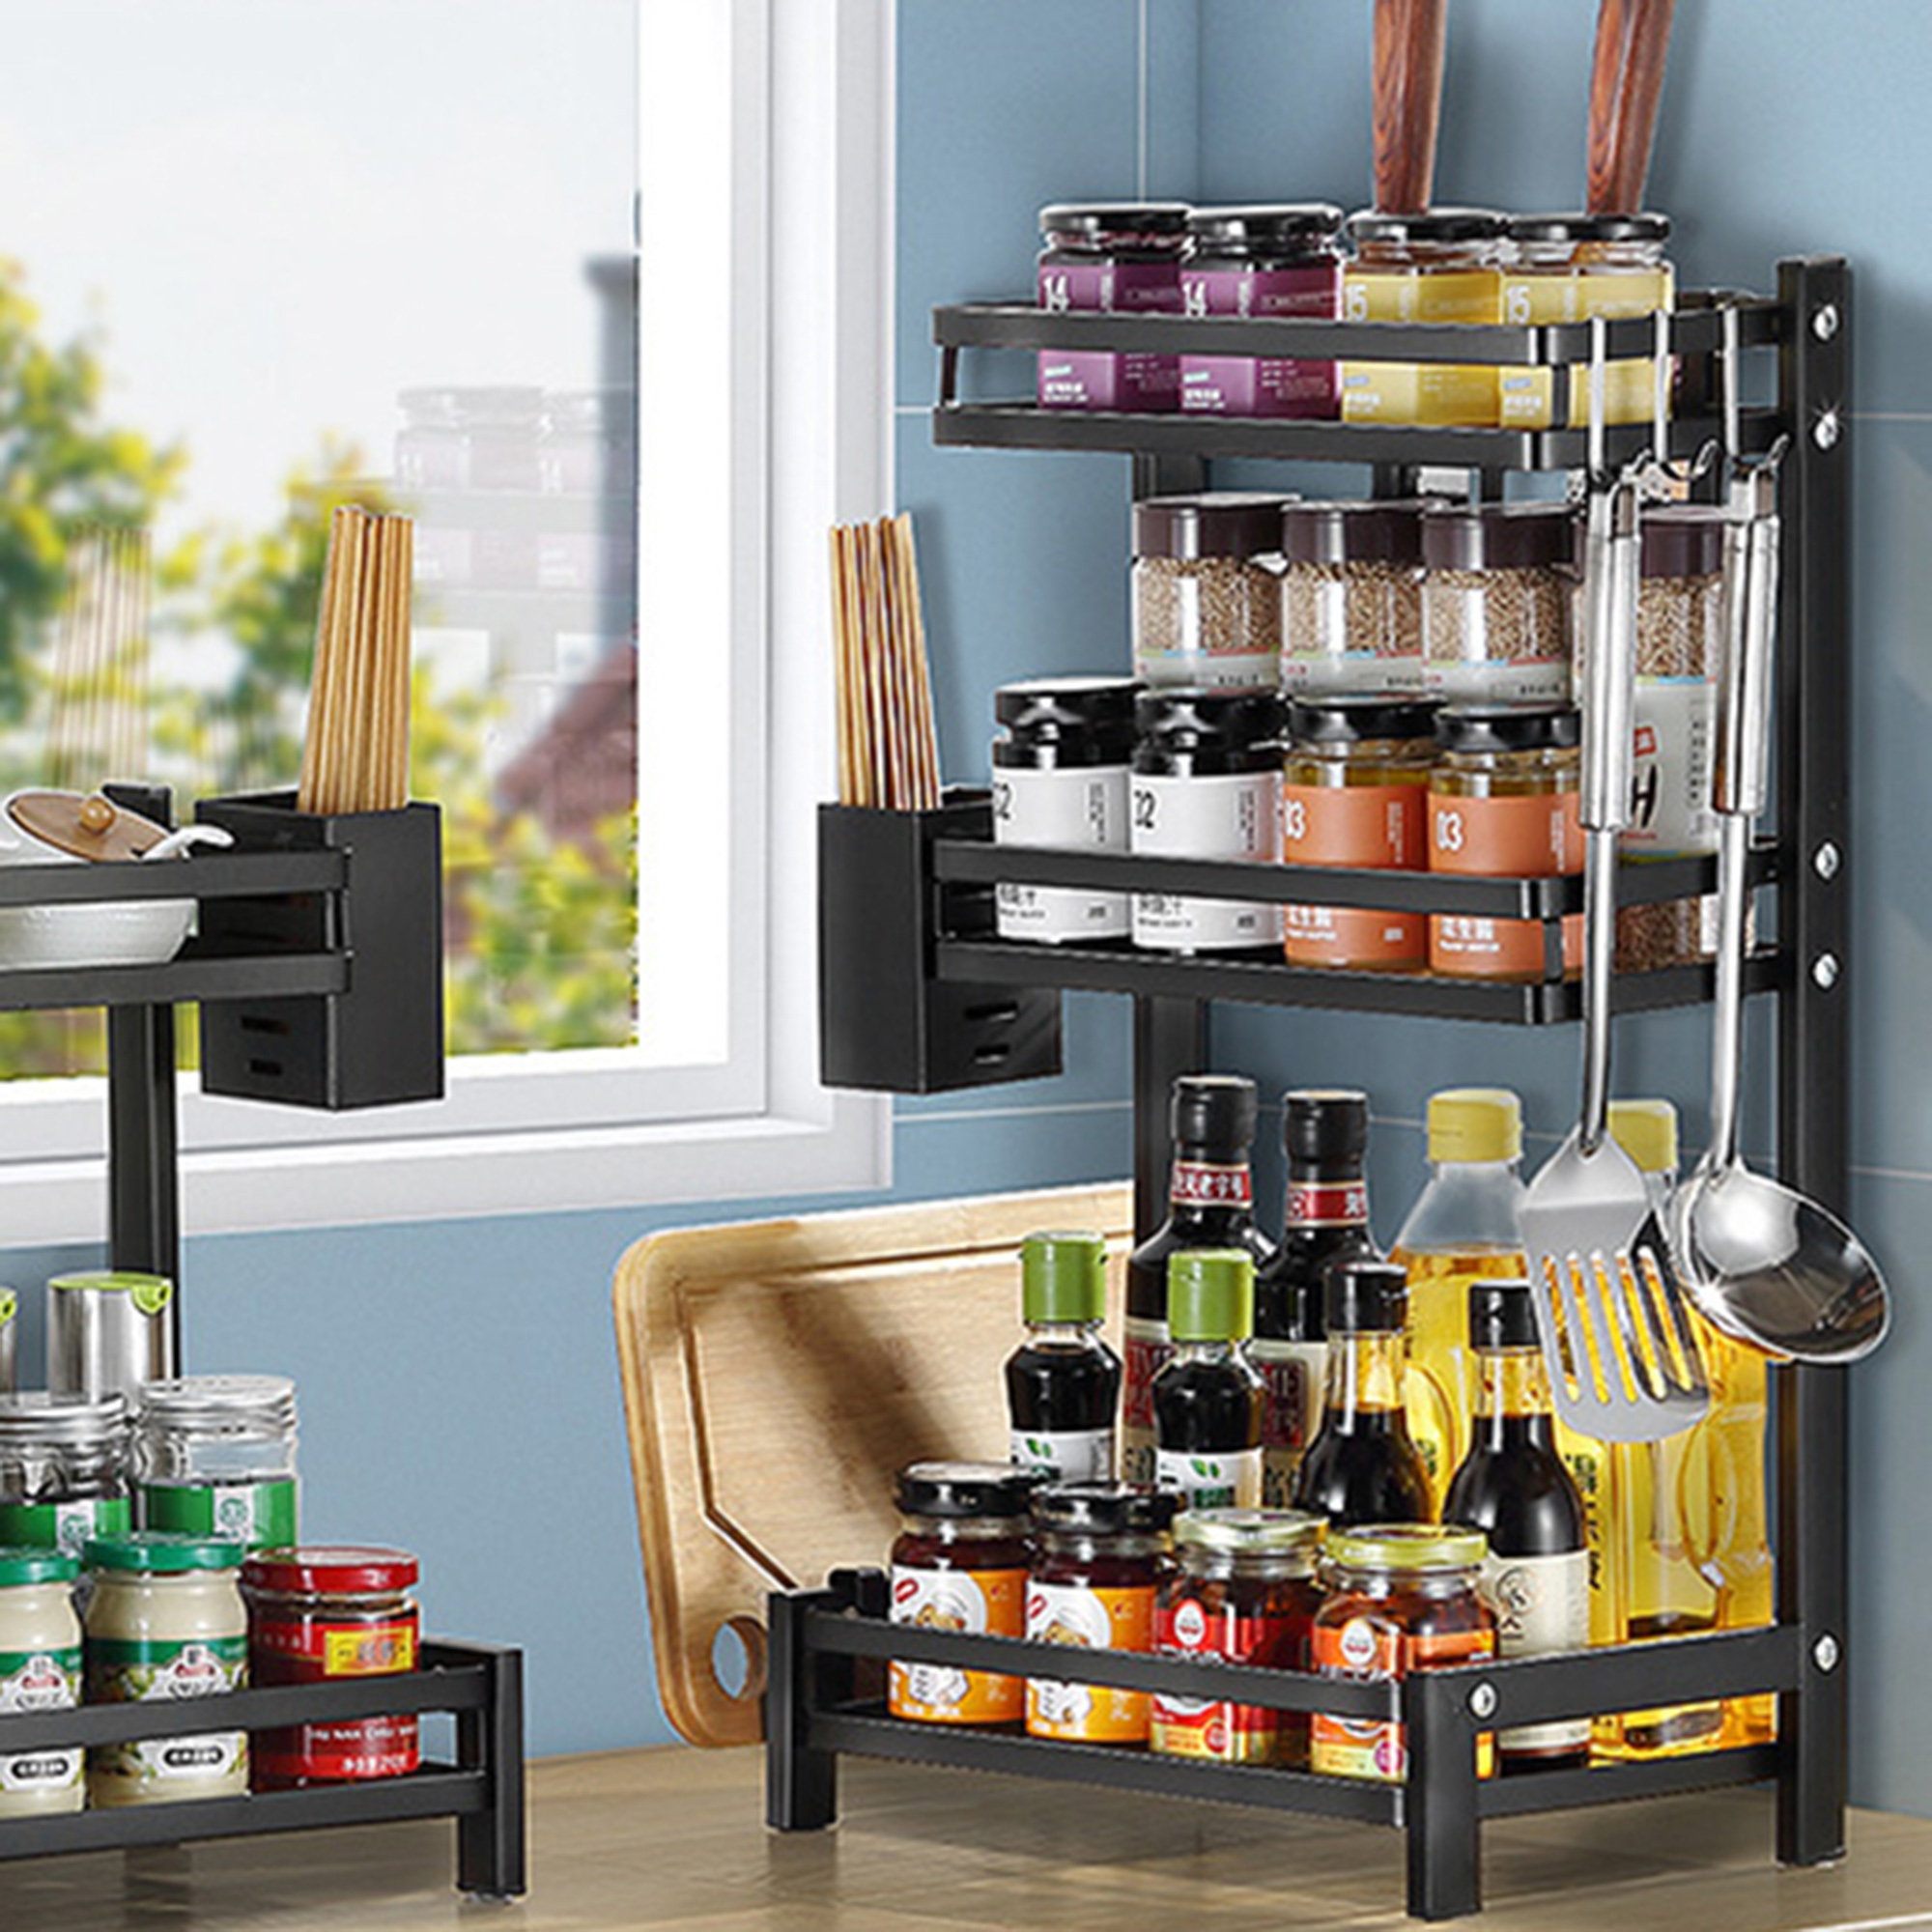 spice rack 3 tier kitchen countertop standing storage organizer or wall mount spice rack organizer spice shelf bathroom shelf holder hanging racks